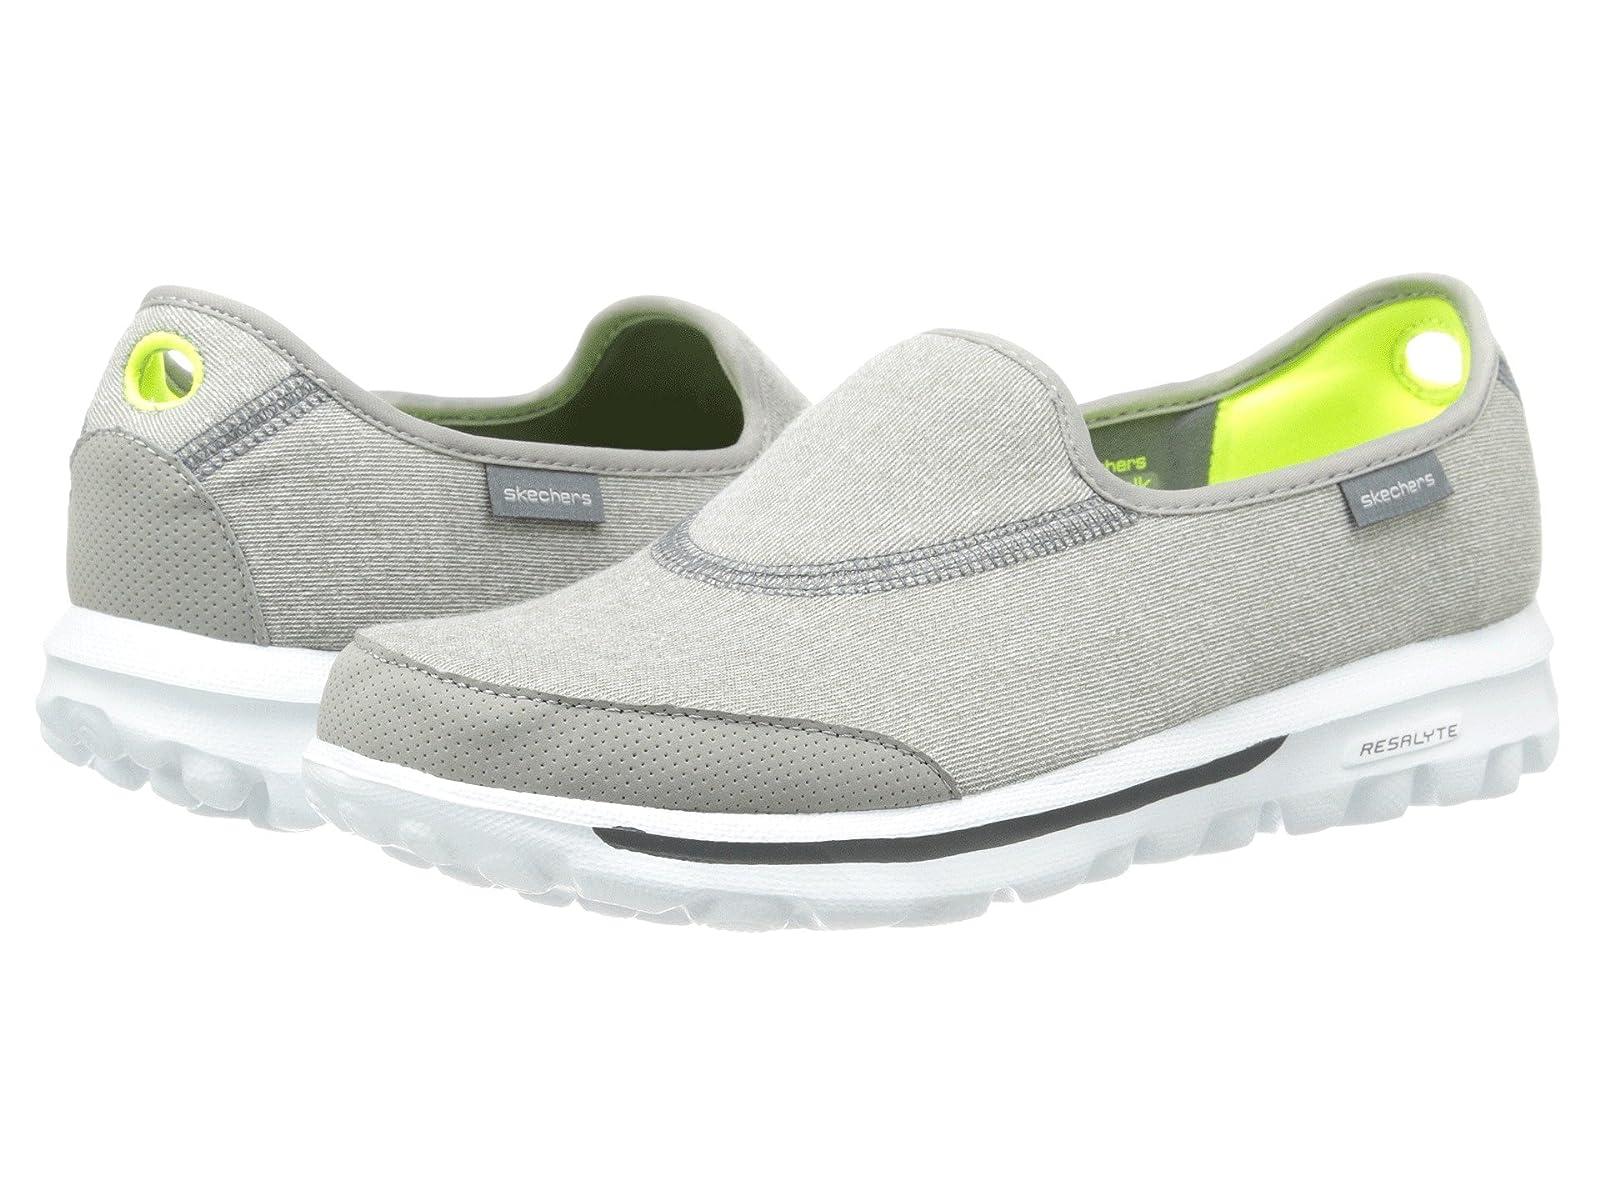 SKECHERS Performance Go Walk ImpressCheap and distinctive eye-catching shoes